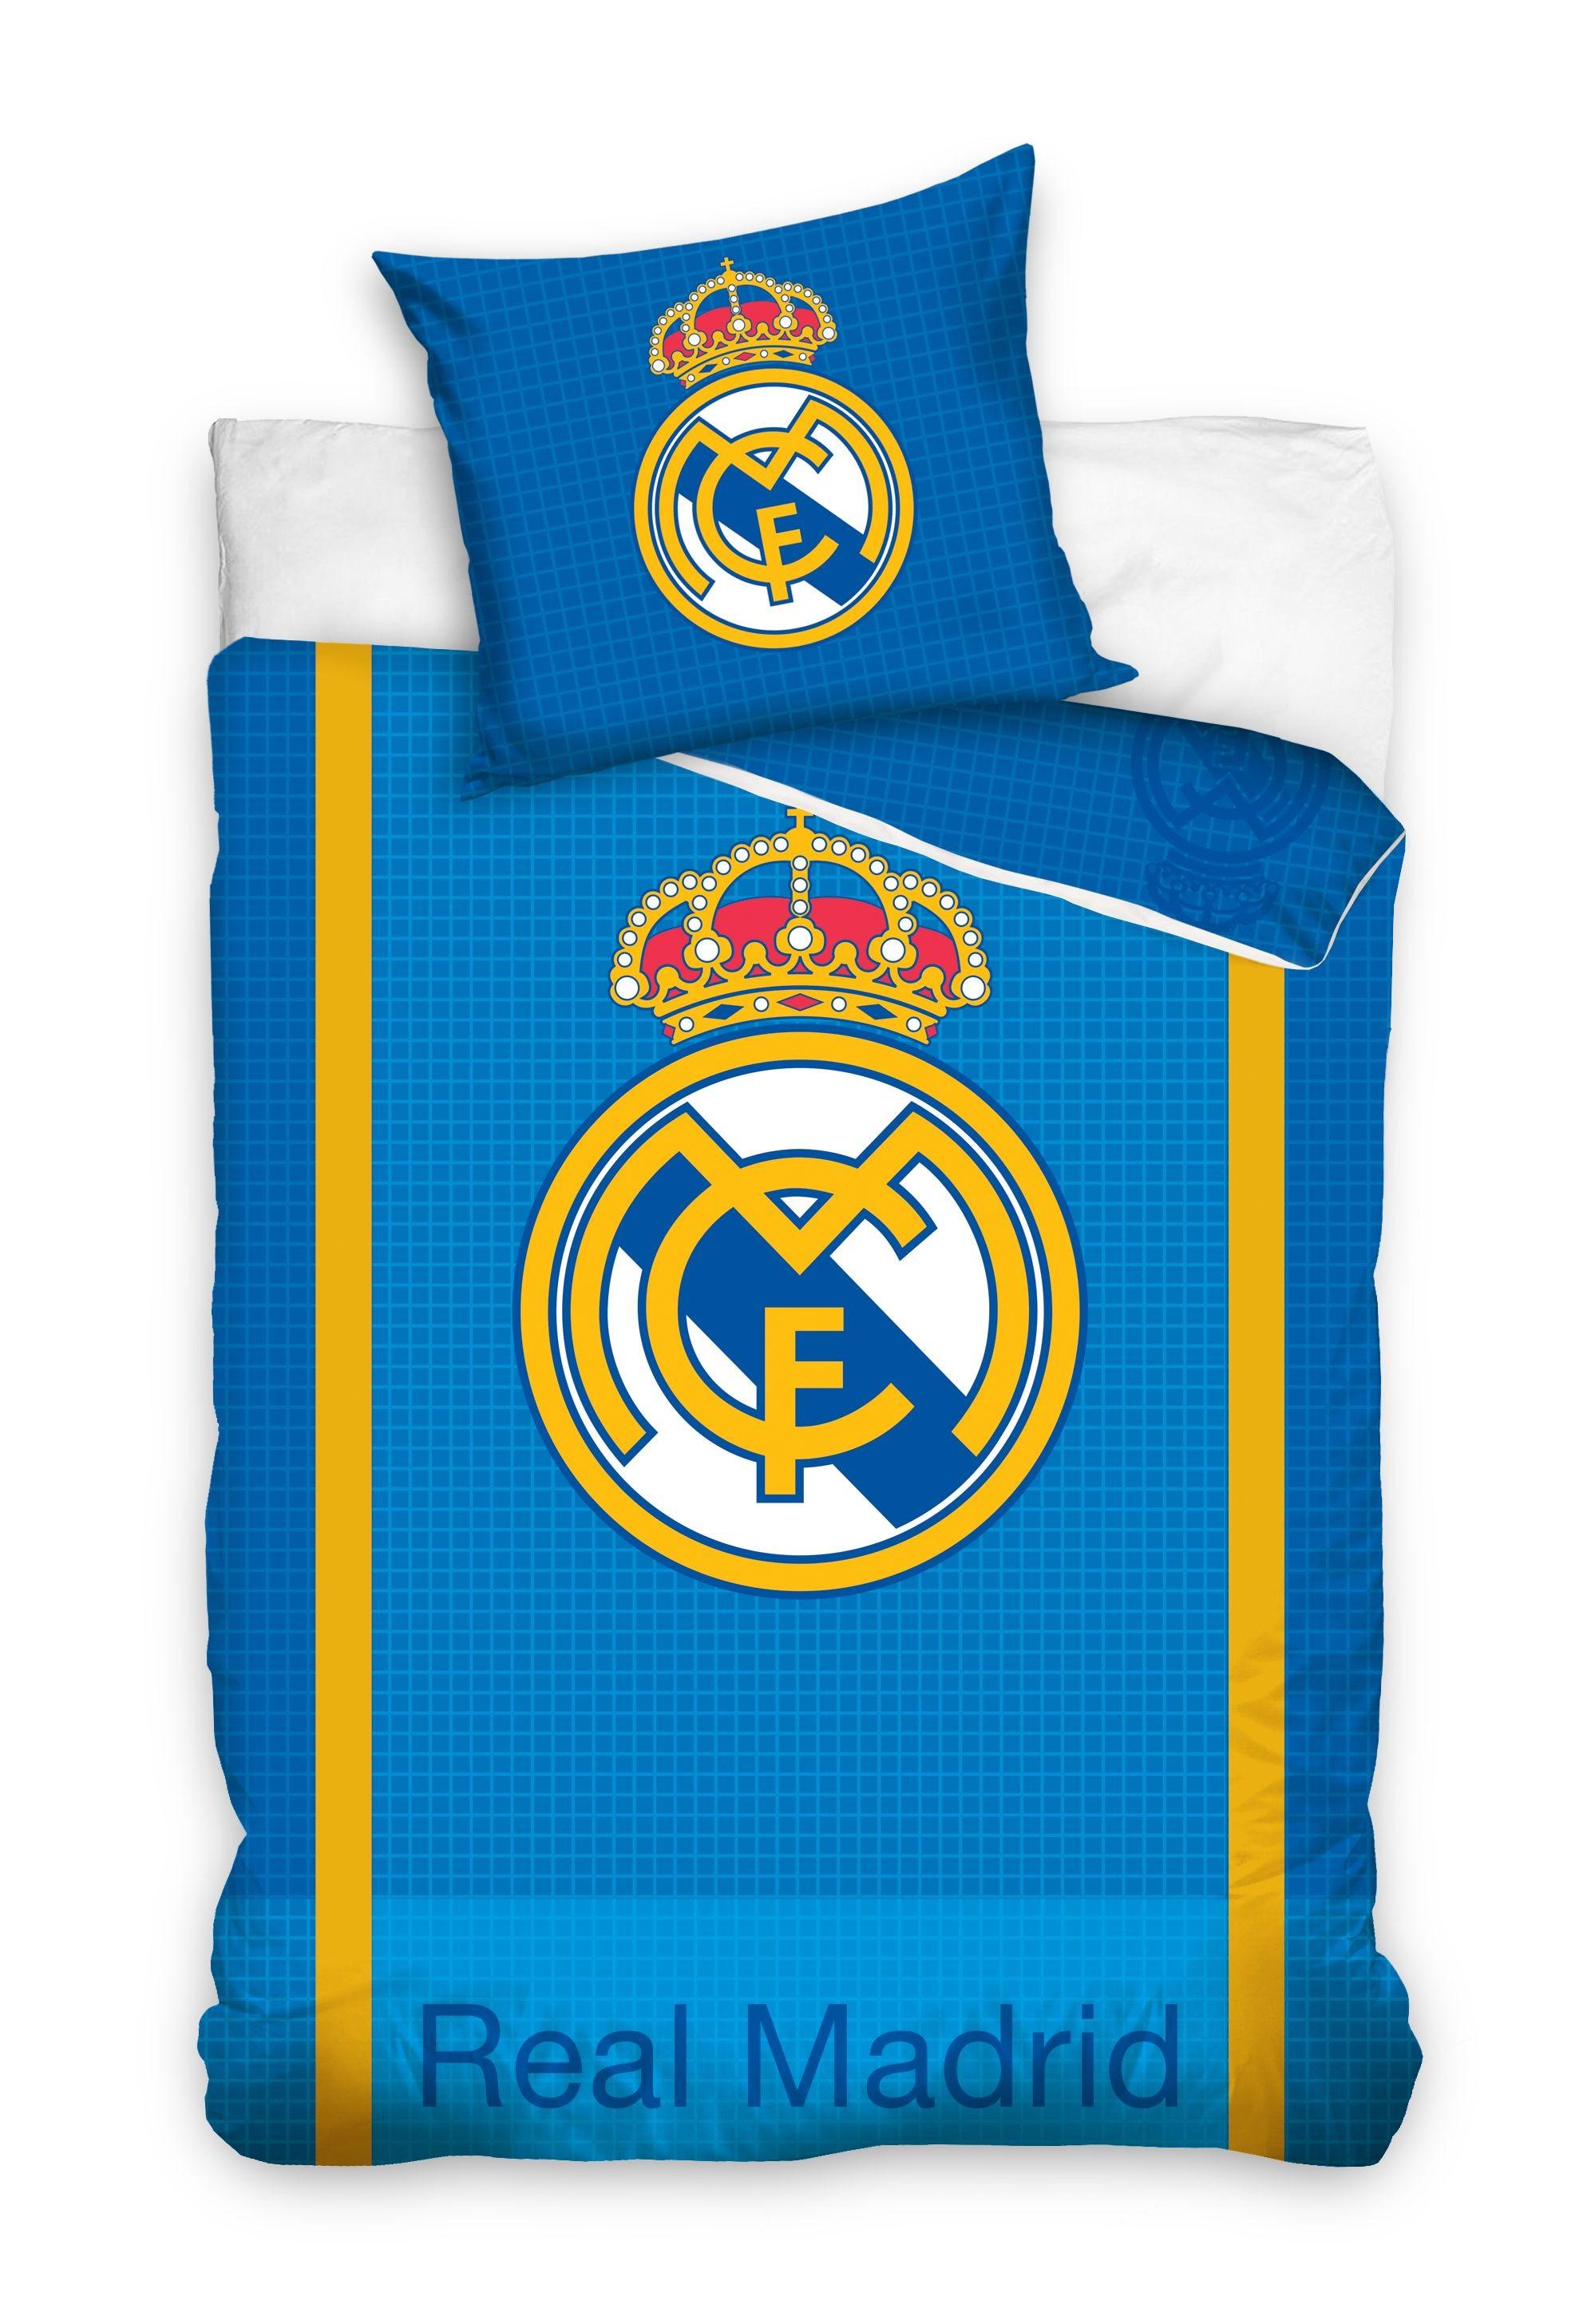 Real Madrid mit klassischem Farbgebung Farbe blau